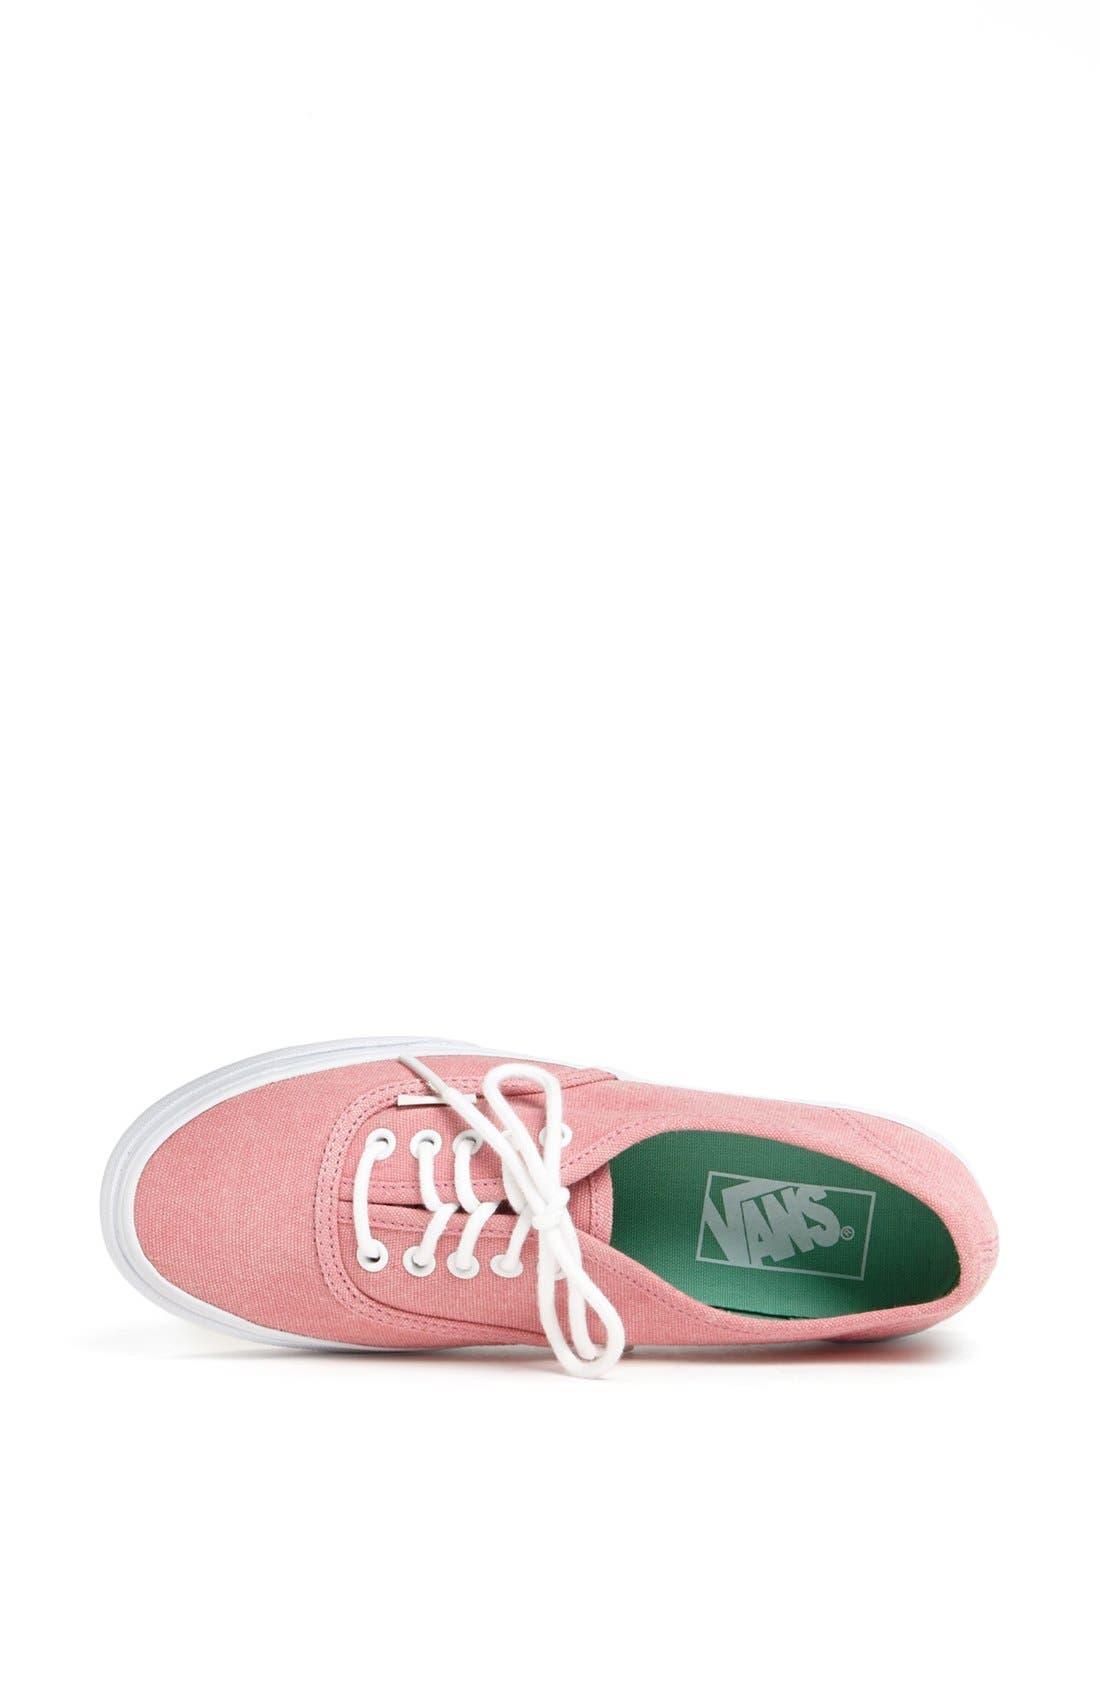 Alternate Image 3  - Vans 'Authentic - Slim' Sneaker (Women)